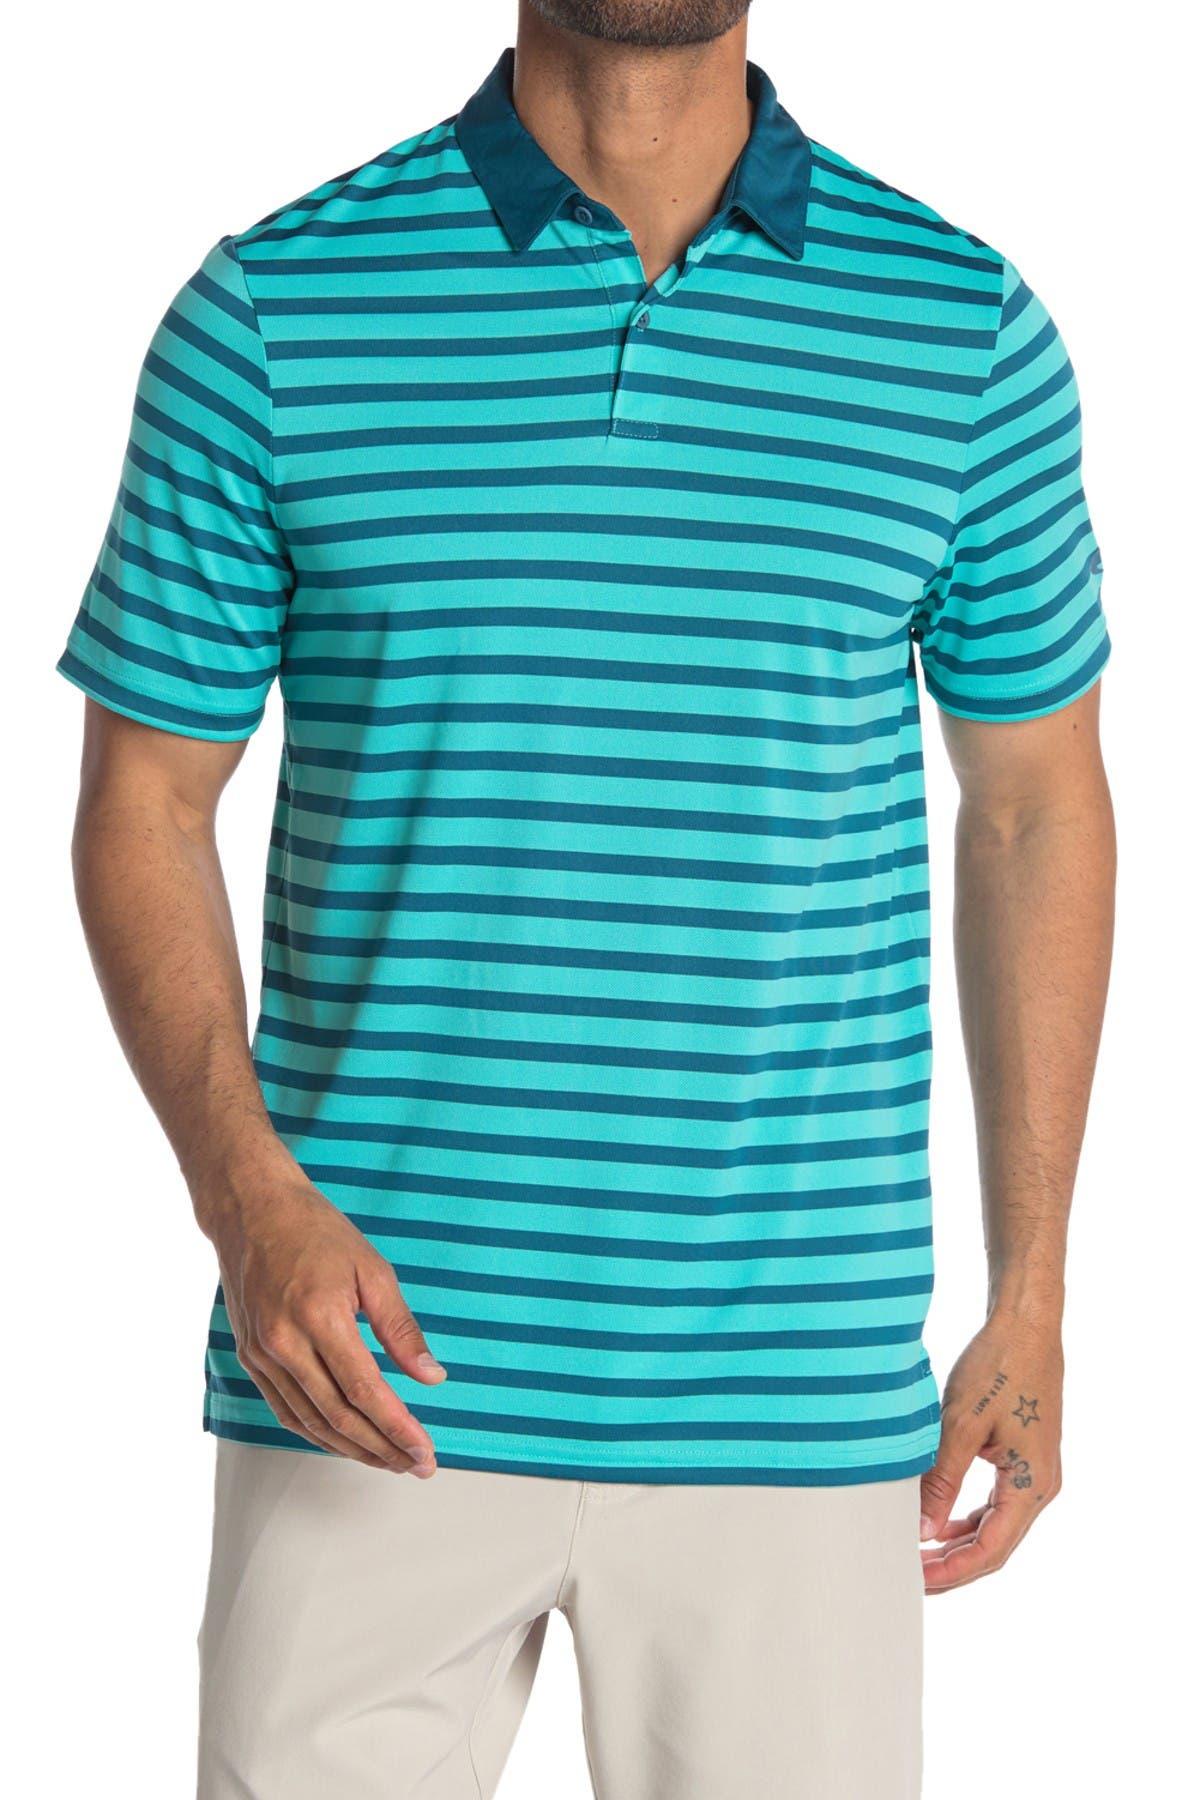 Image of Oakley Striped Golf Polo